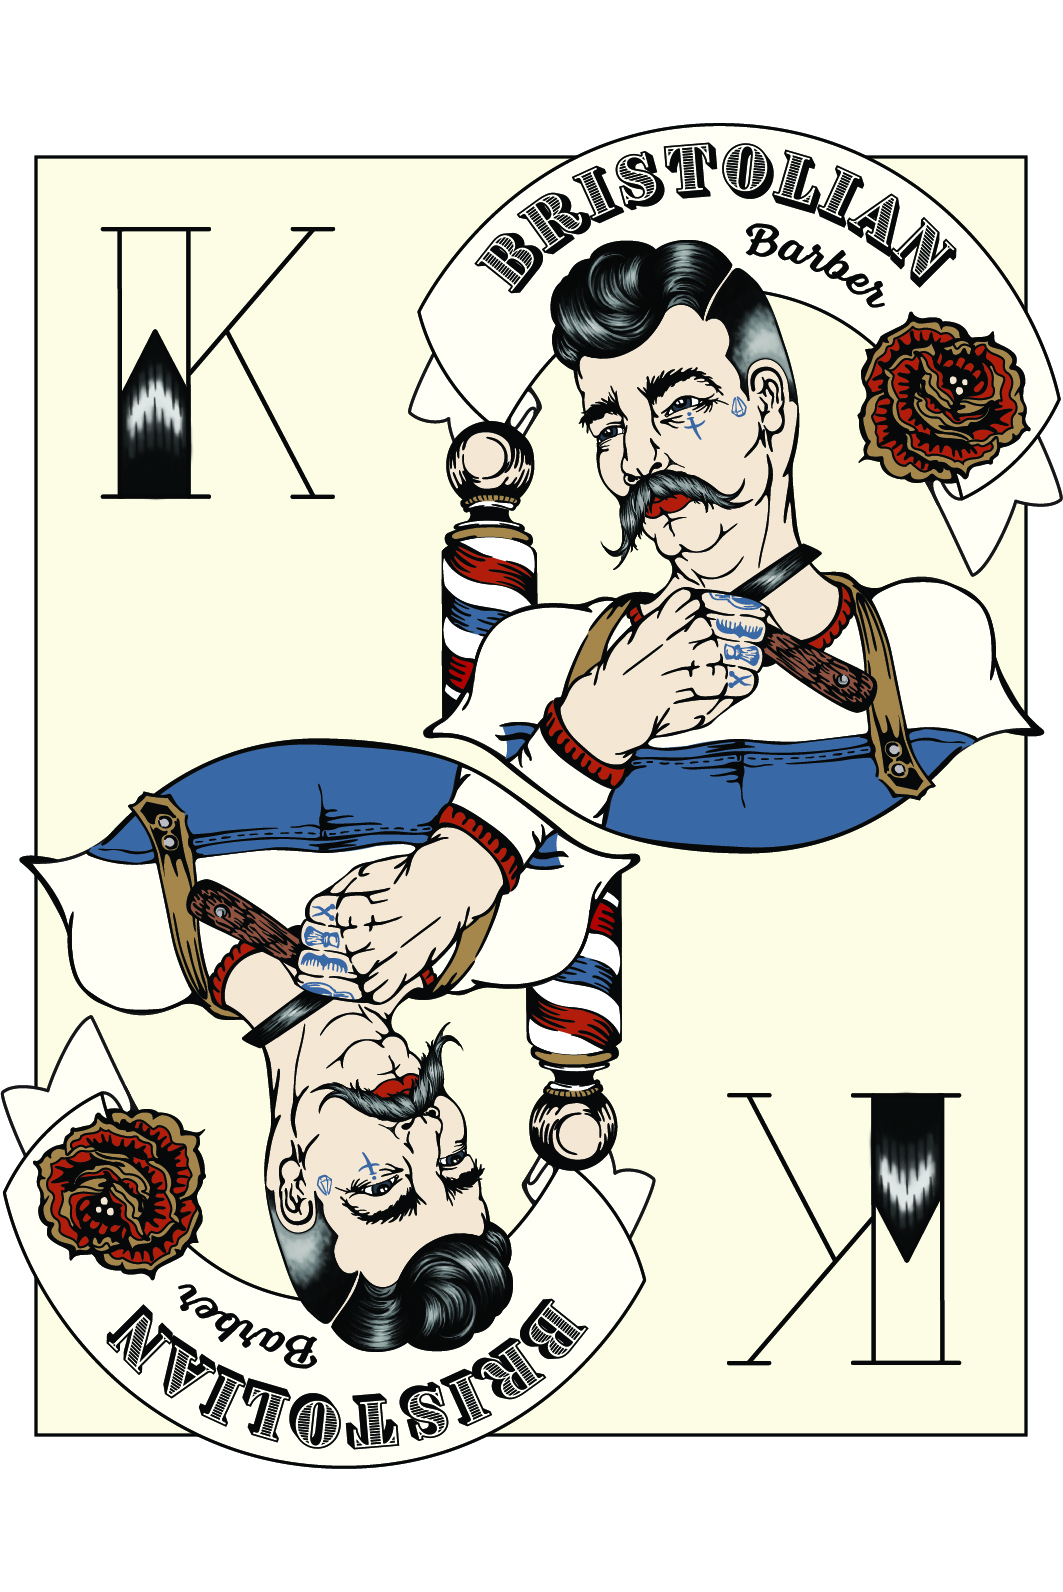 Bristolian Barber Card